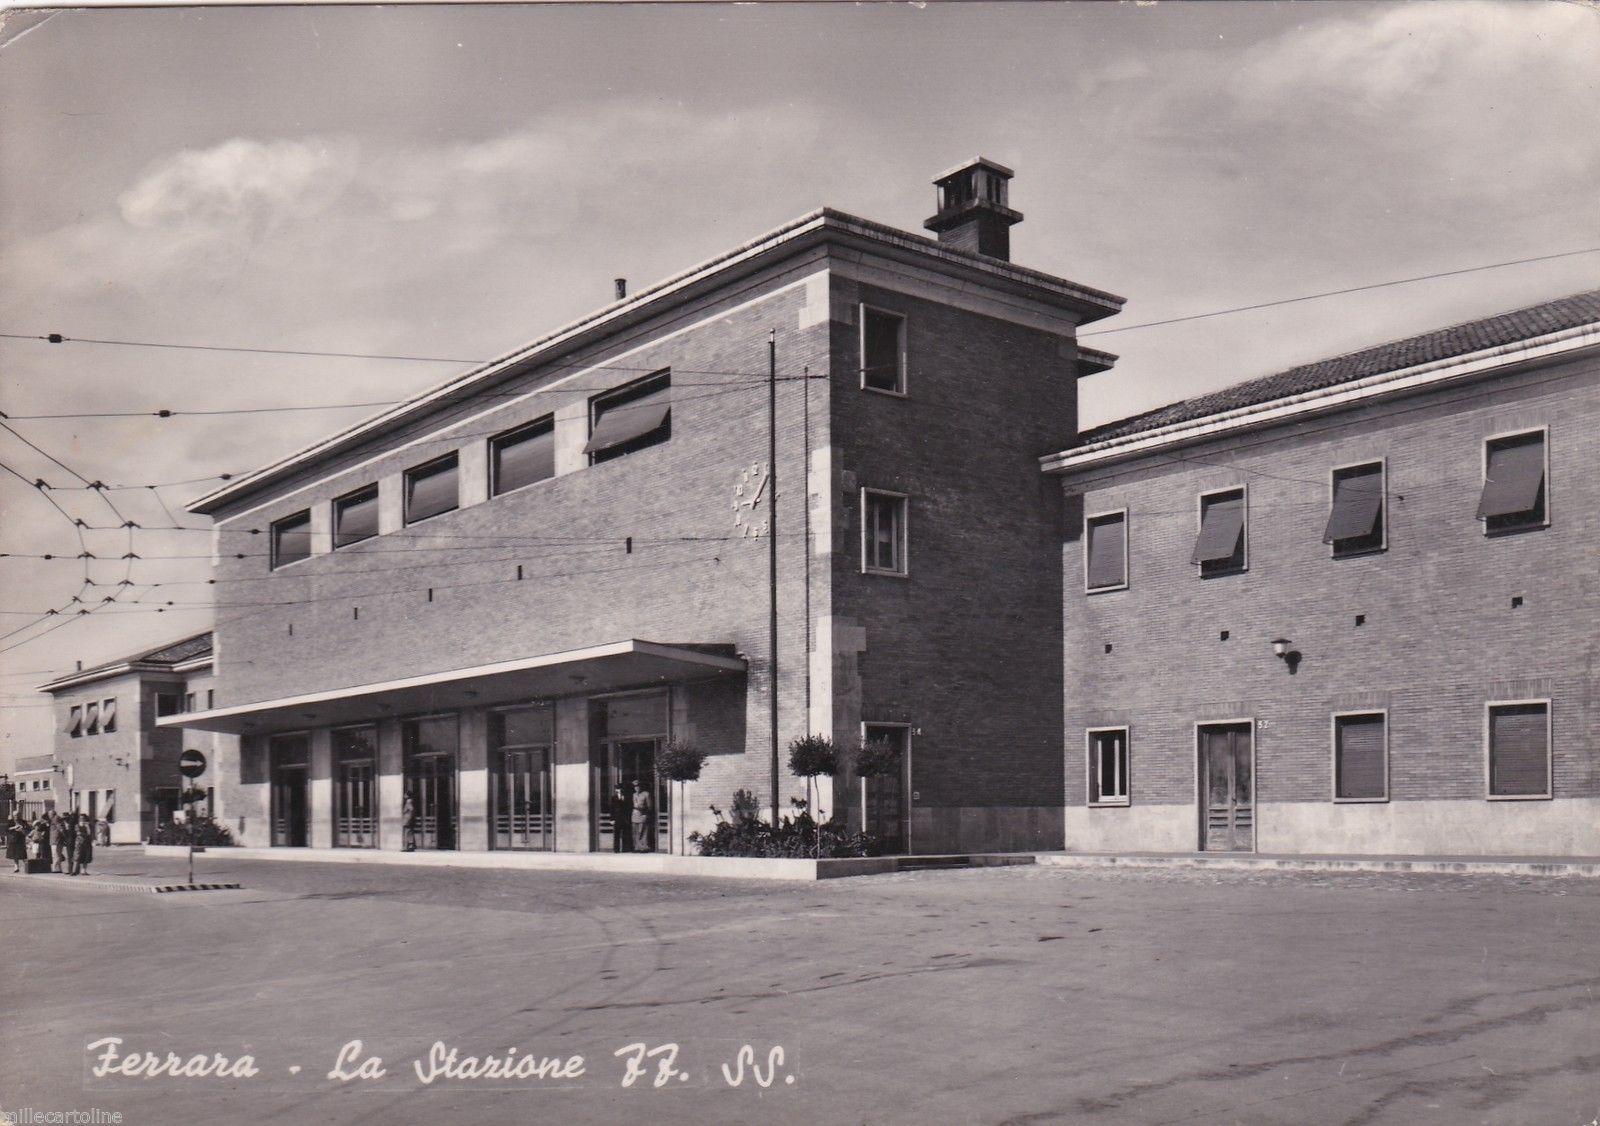 Ferrara (2)